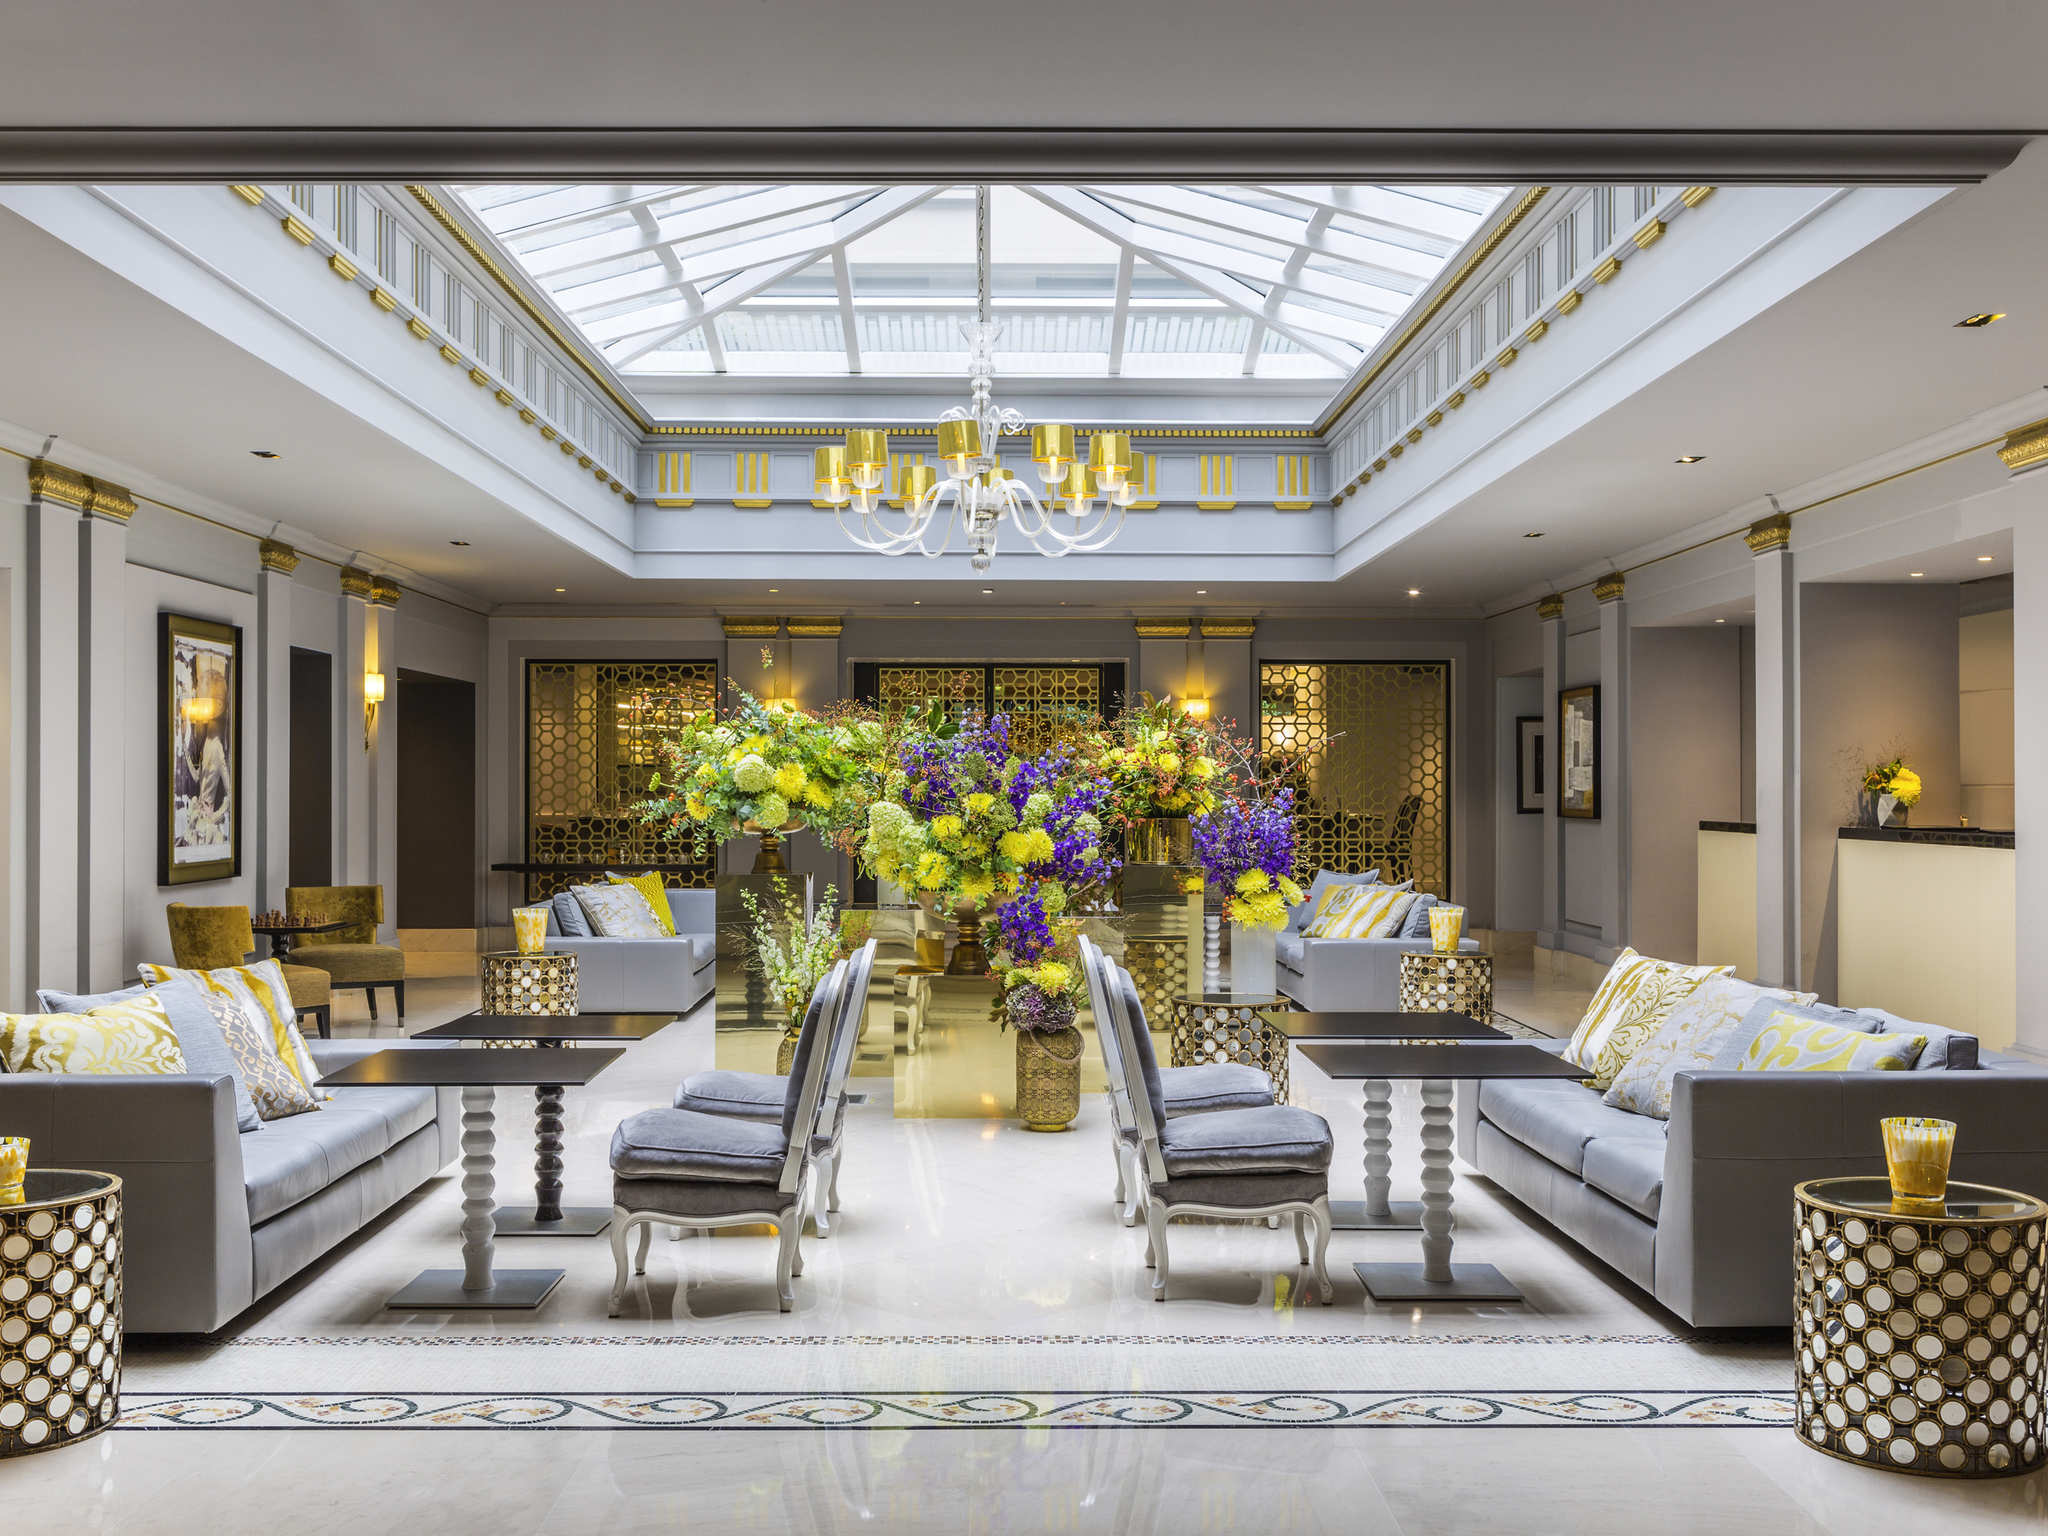 Hotel – Sofitel Paris Le Faubourg